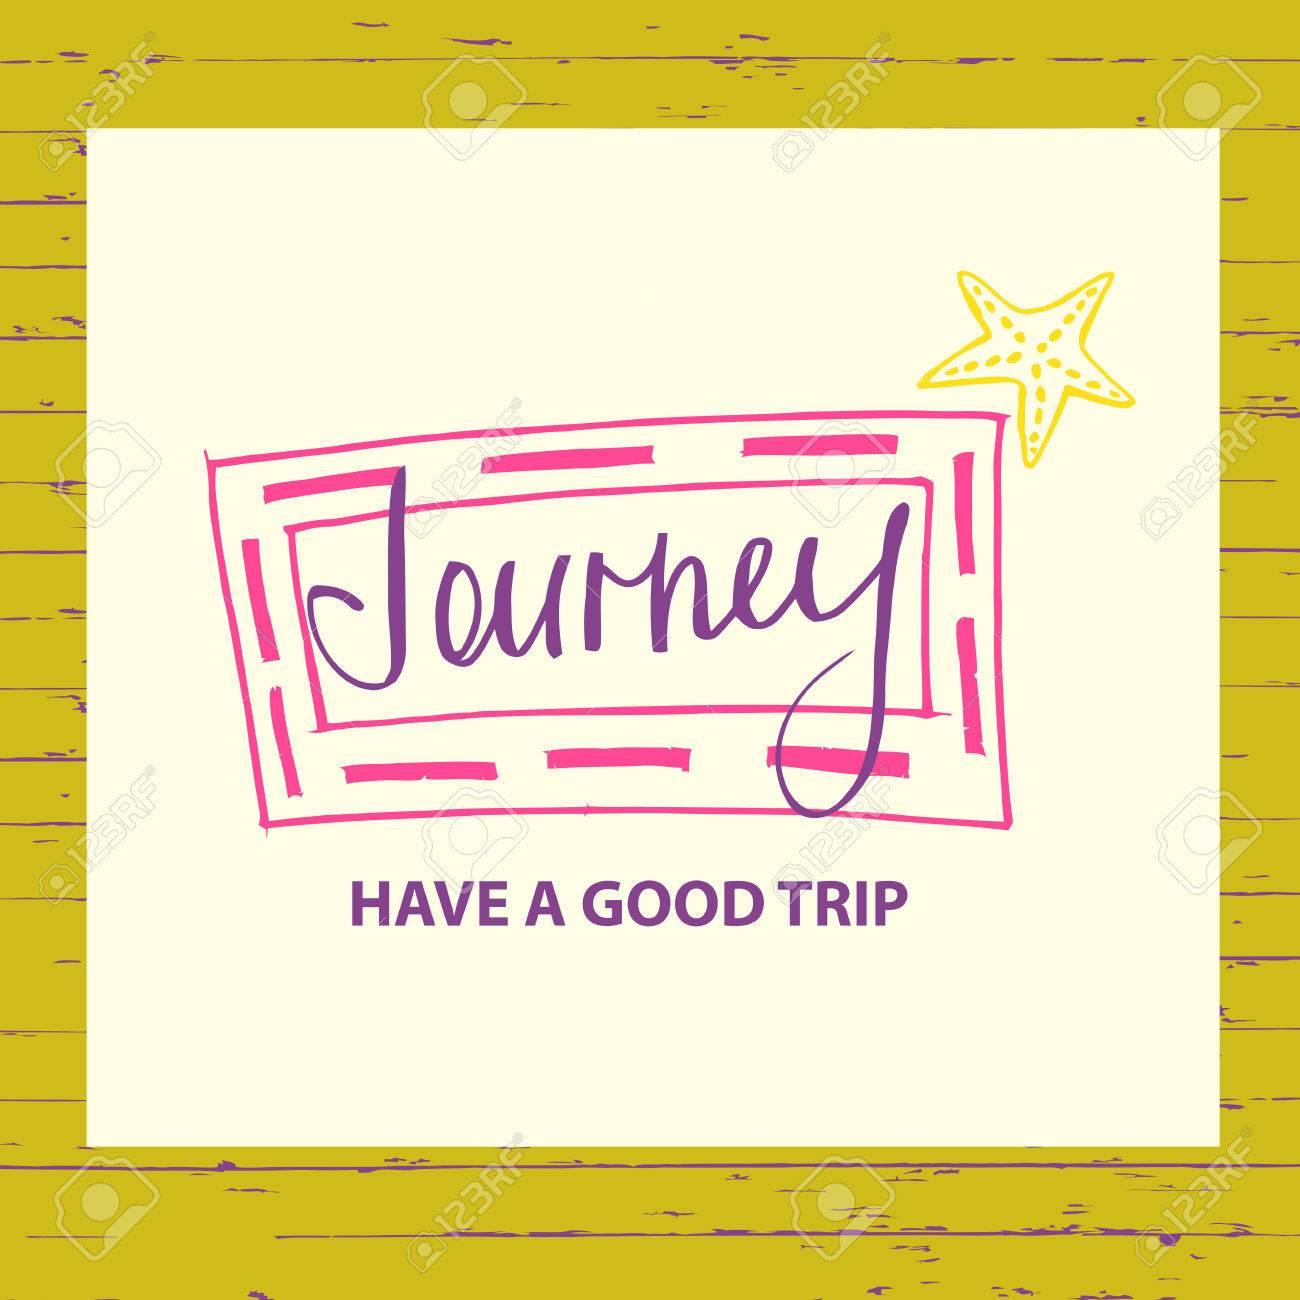 Illustration for advertising tourism companies, tour operators